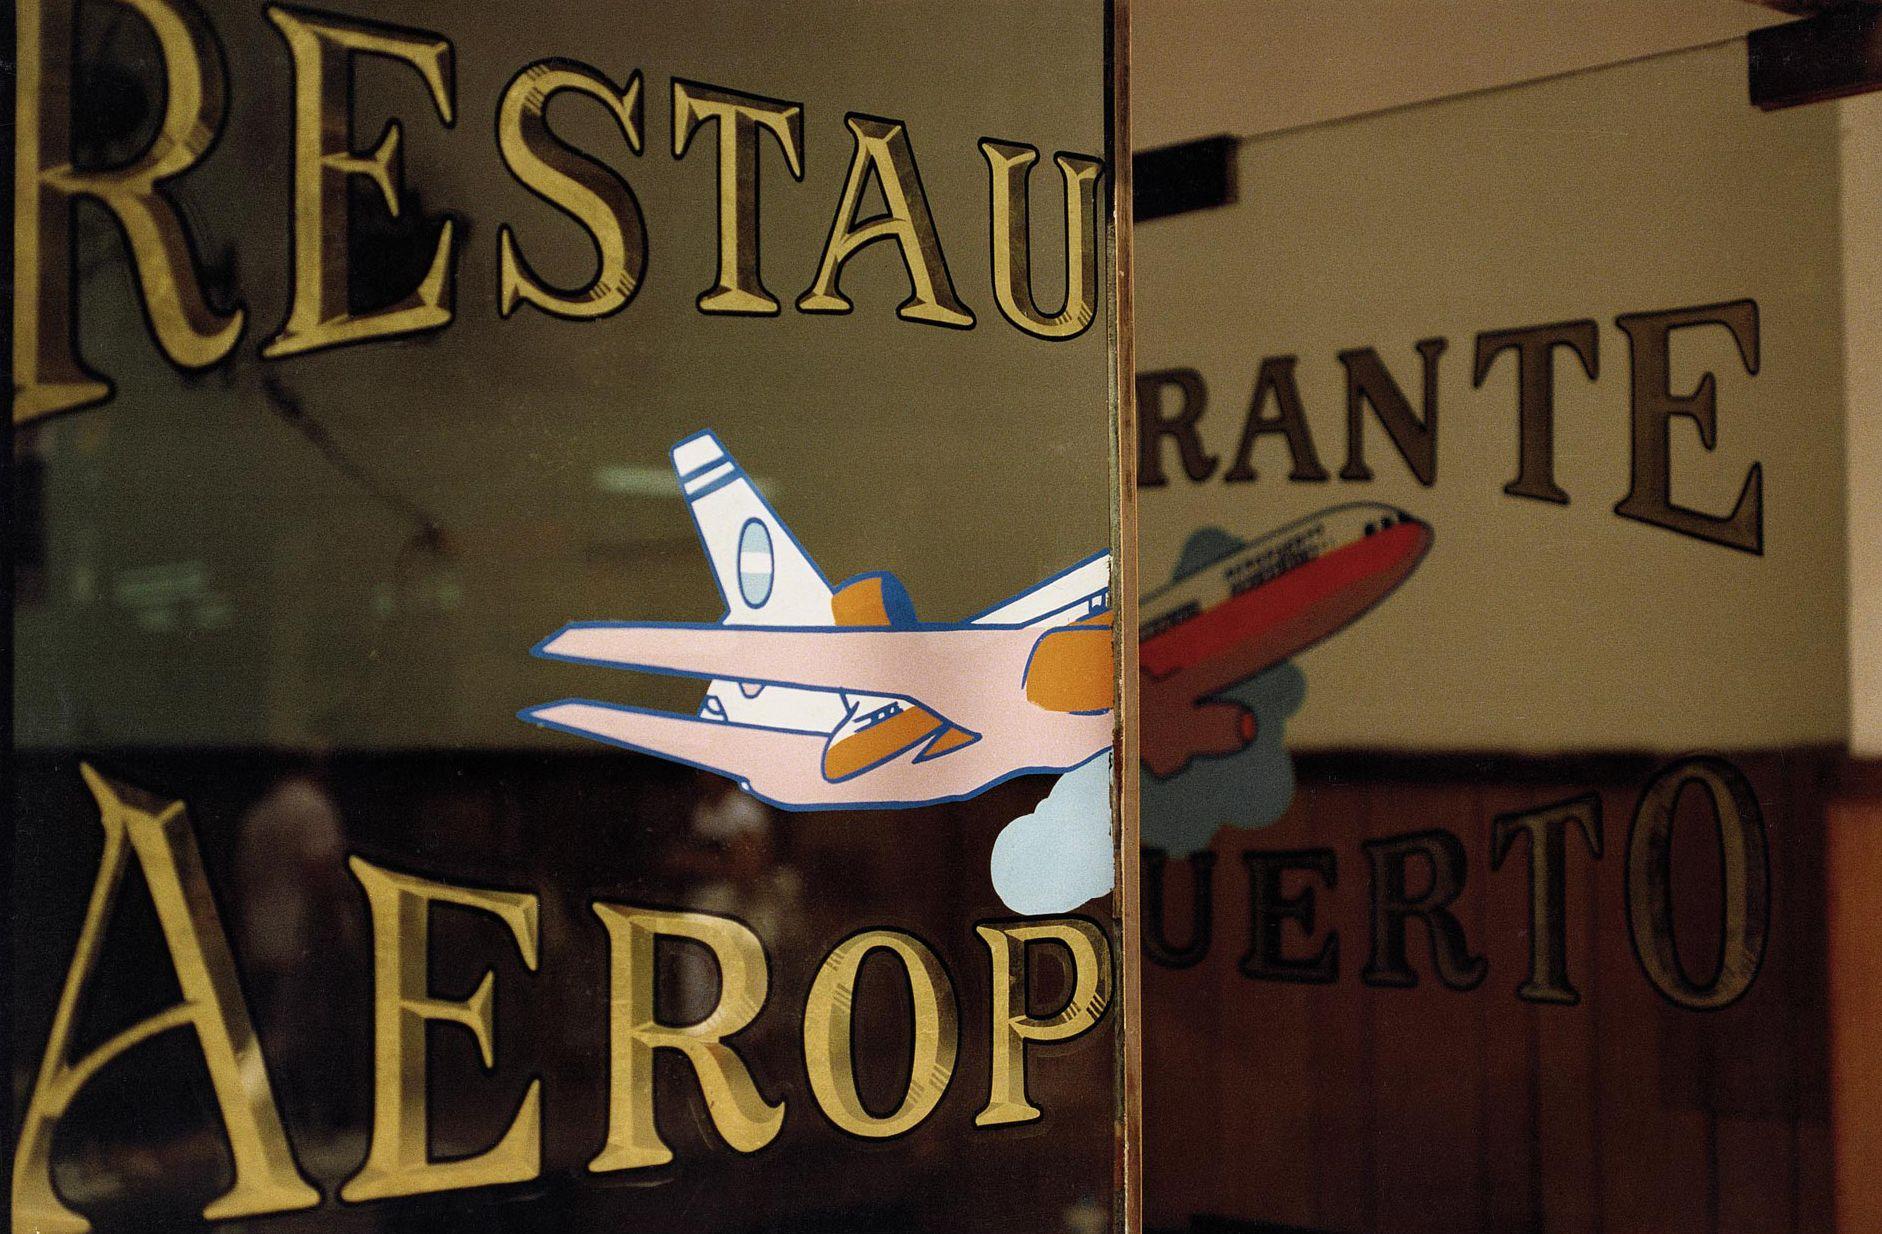 Restaurante Aeropuerto, Microcentro, 1986